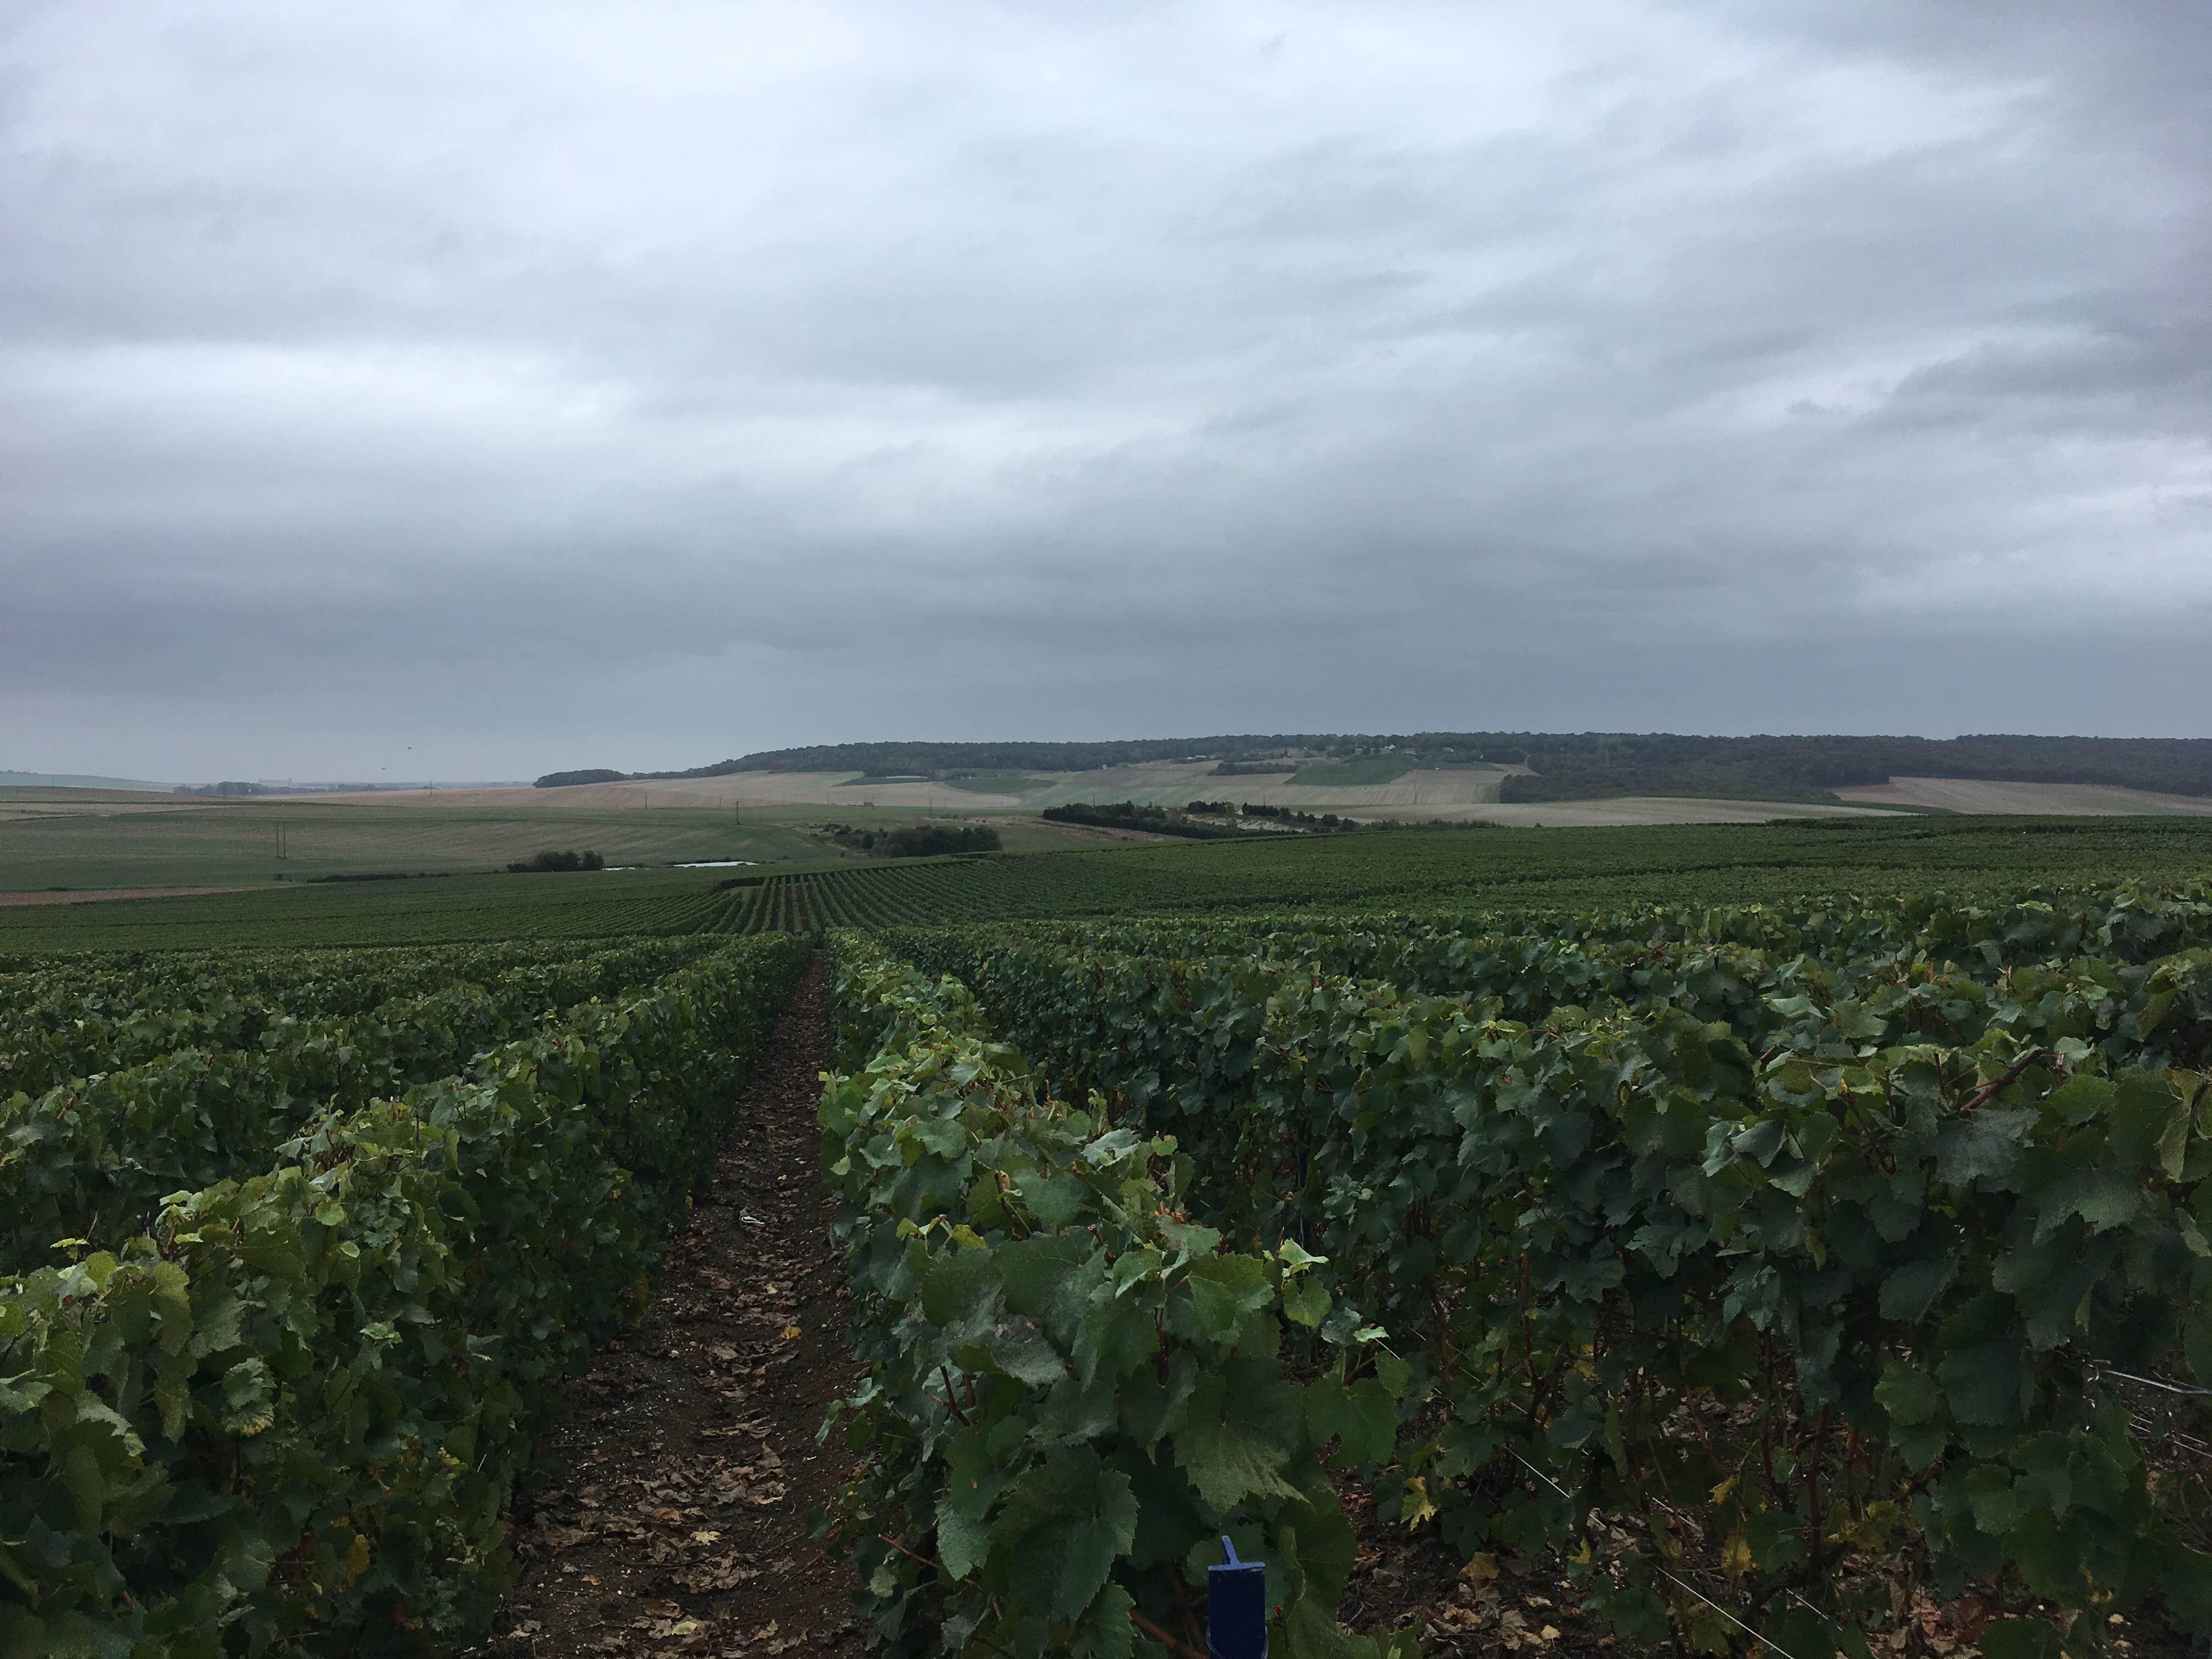 Travaux viticoles manuels, Sarl Meulot, Fèrebrianges, Marne, 51